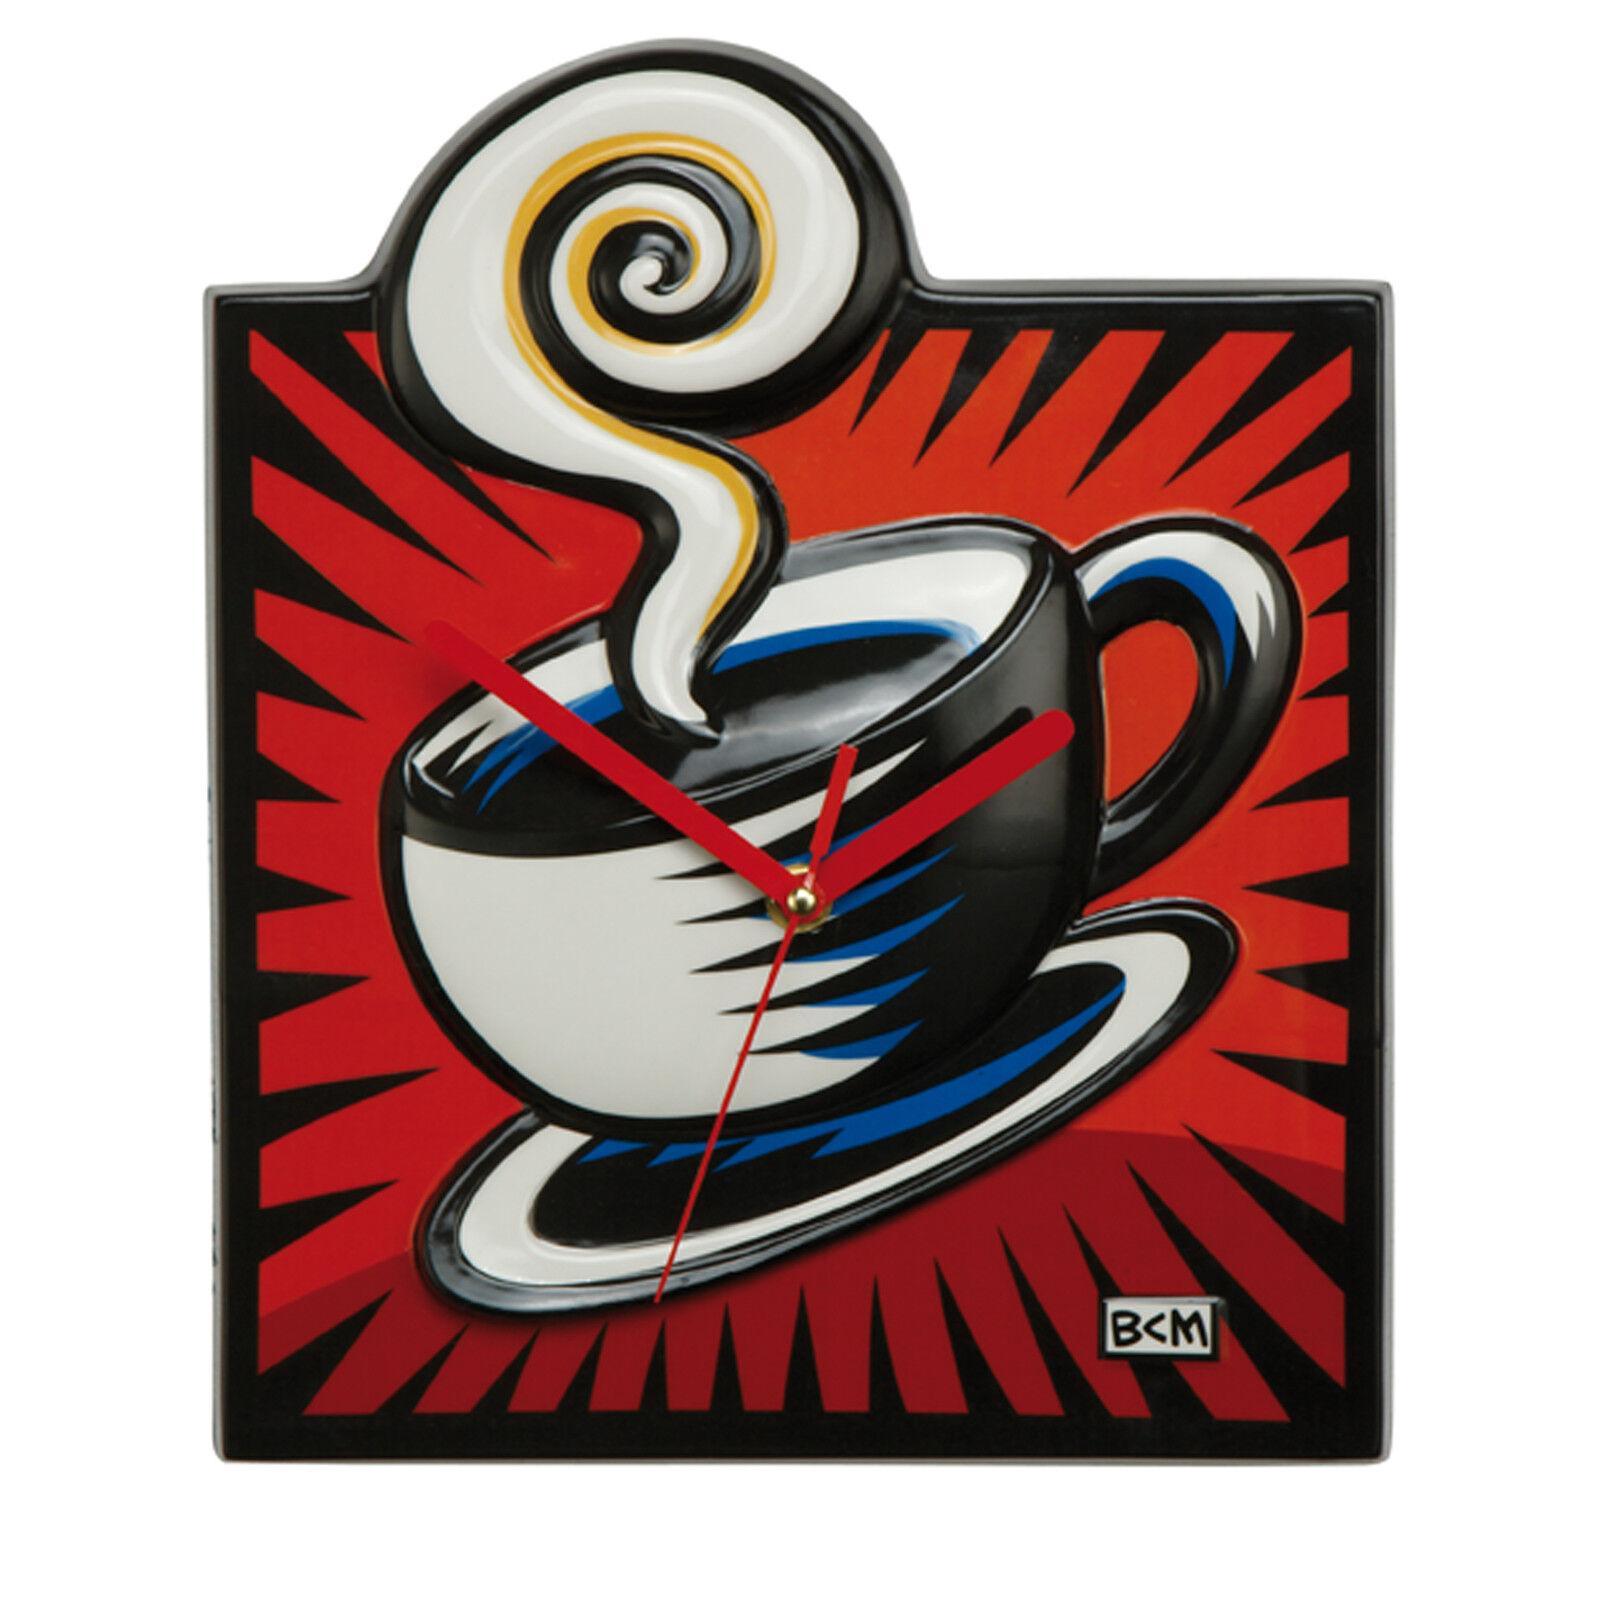 Goebel ARTIS Orbis Uhr Coffee Break - rot Wanduhr Burton Morris Pop Art